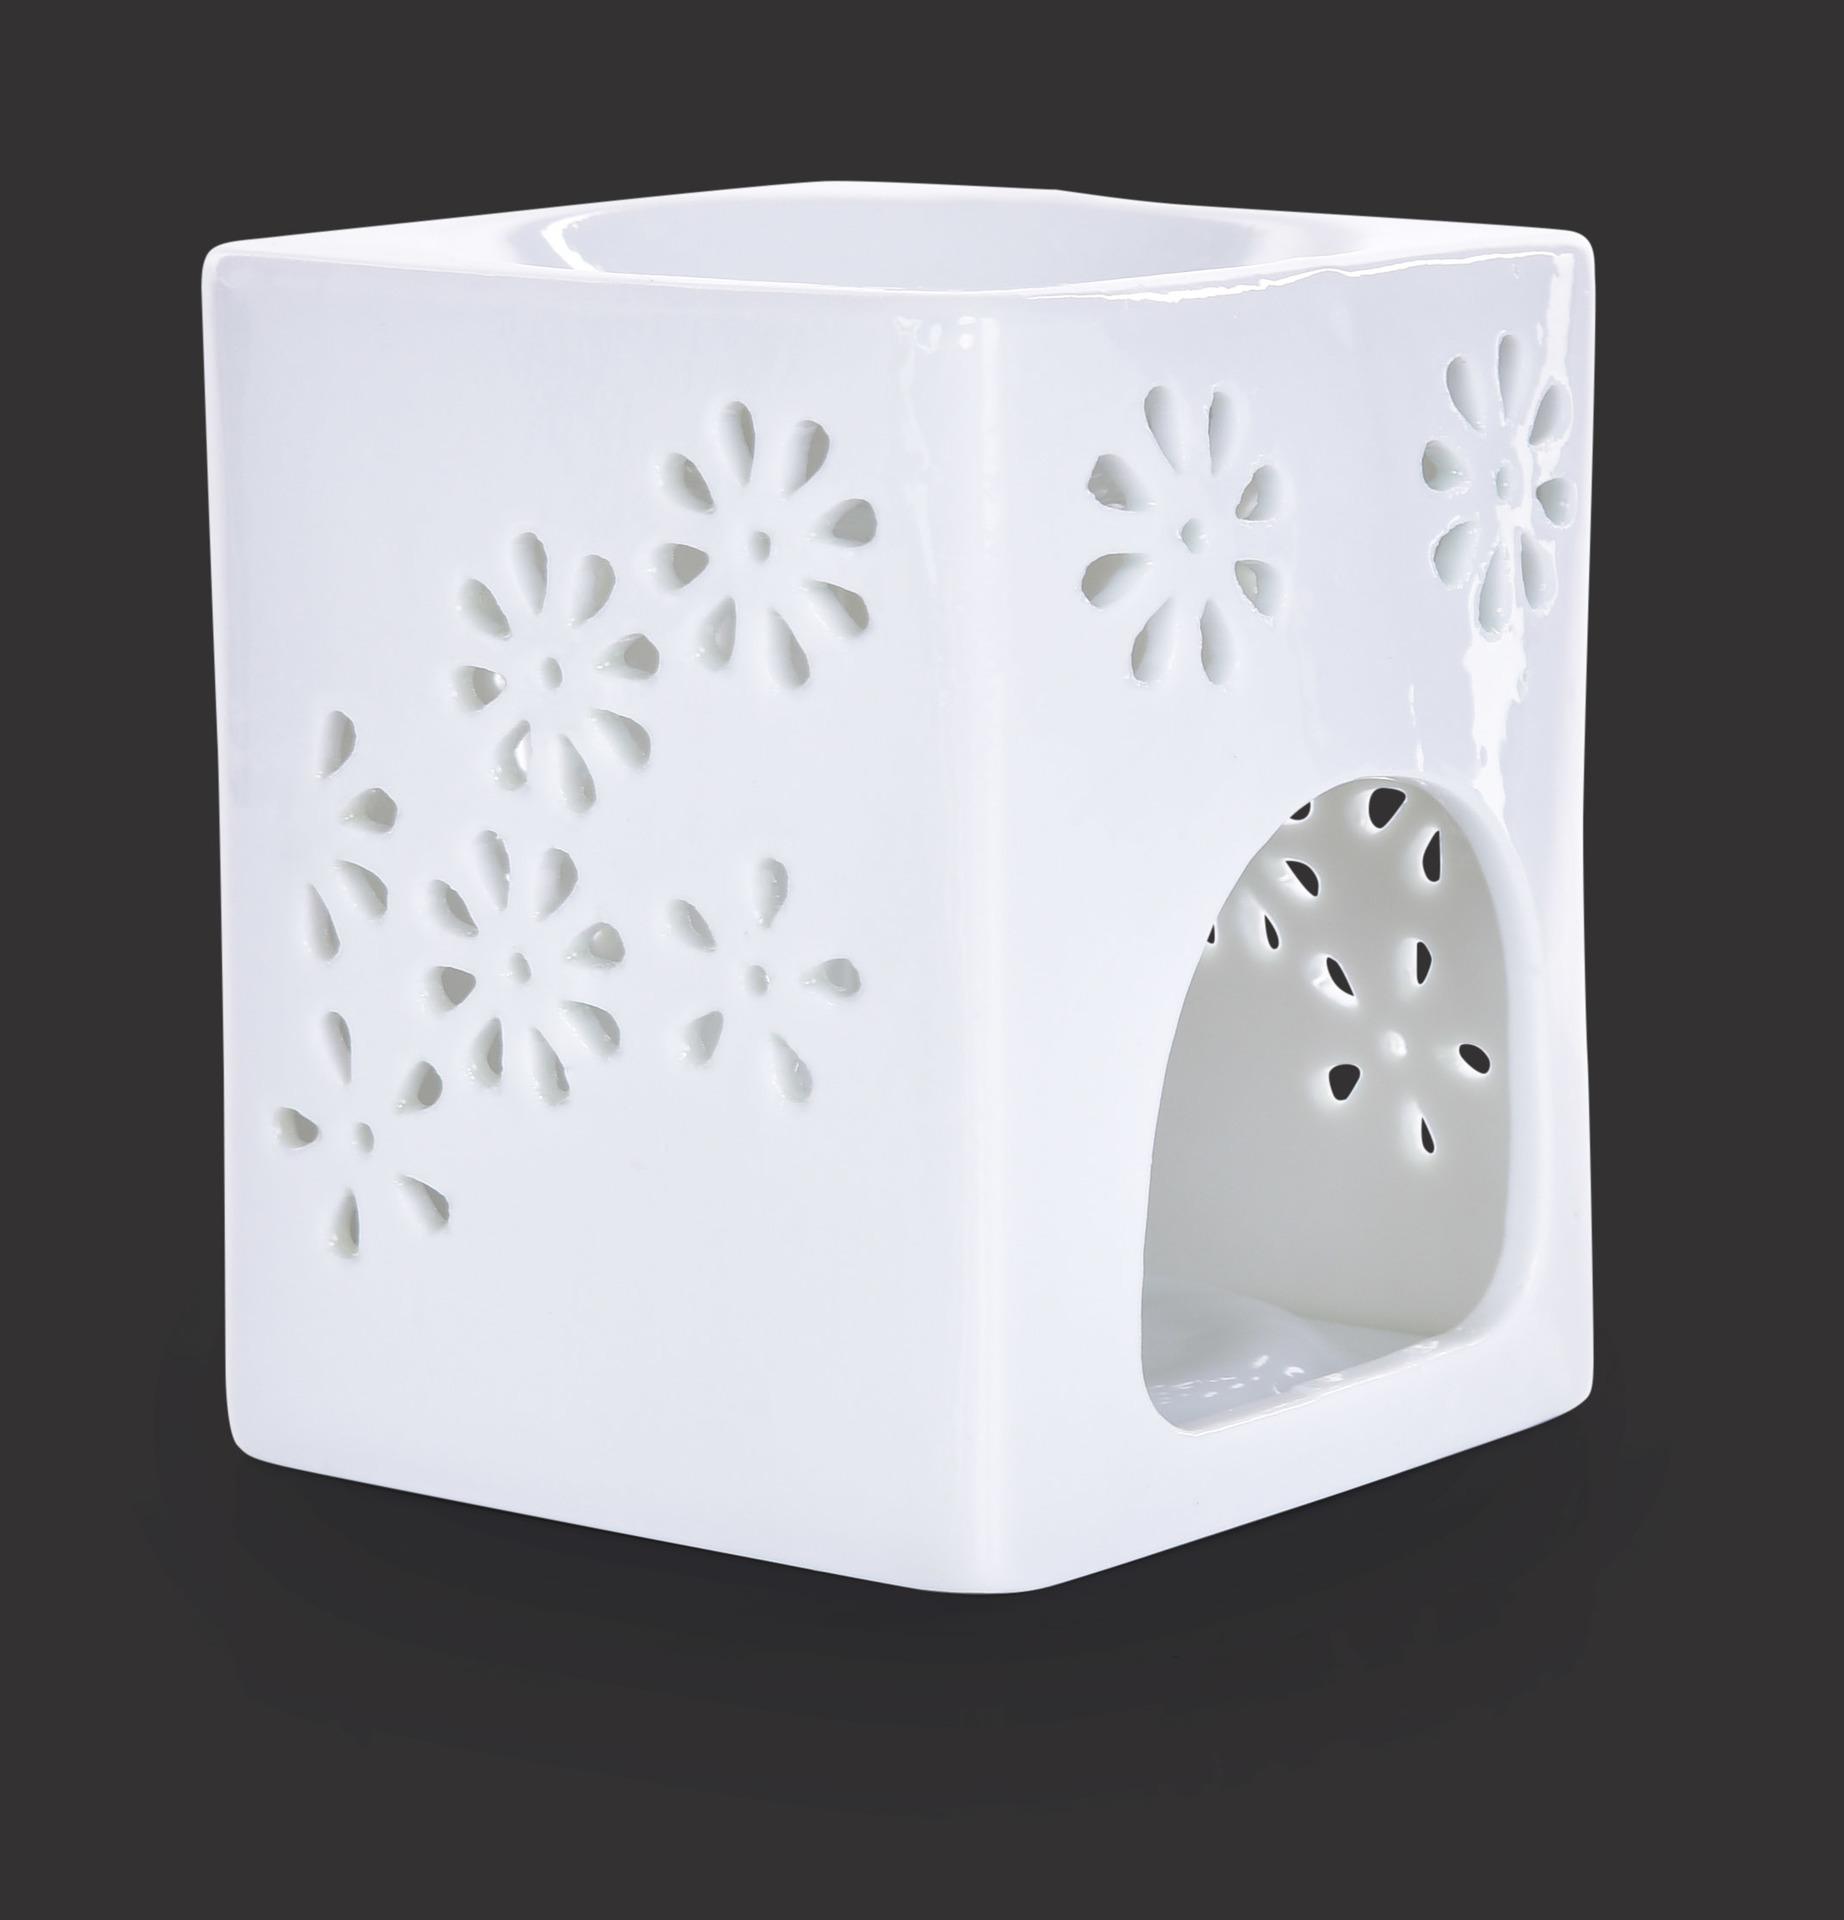 Keramická aromalampa na čajové svíčky s lesklou bílou glazurou